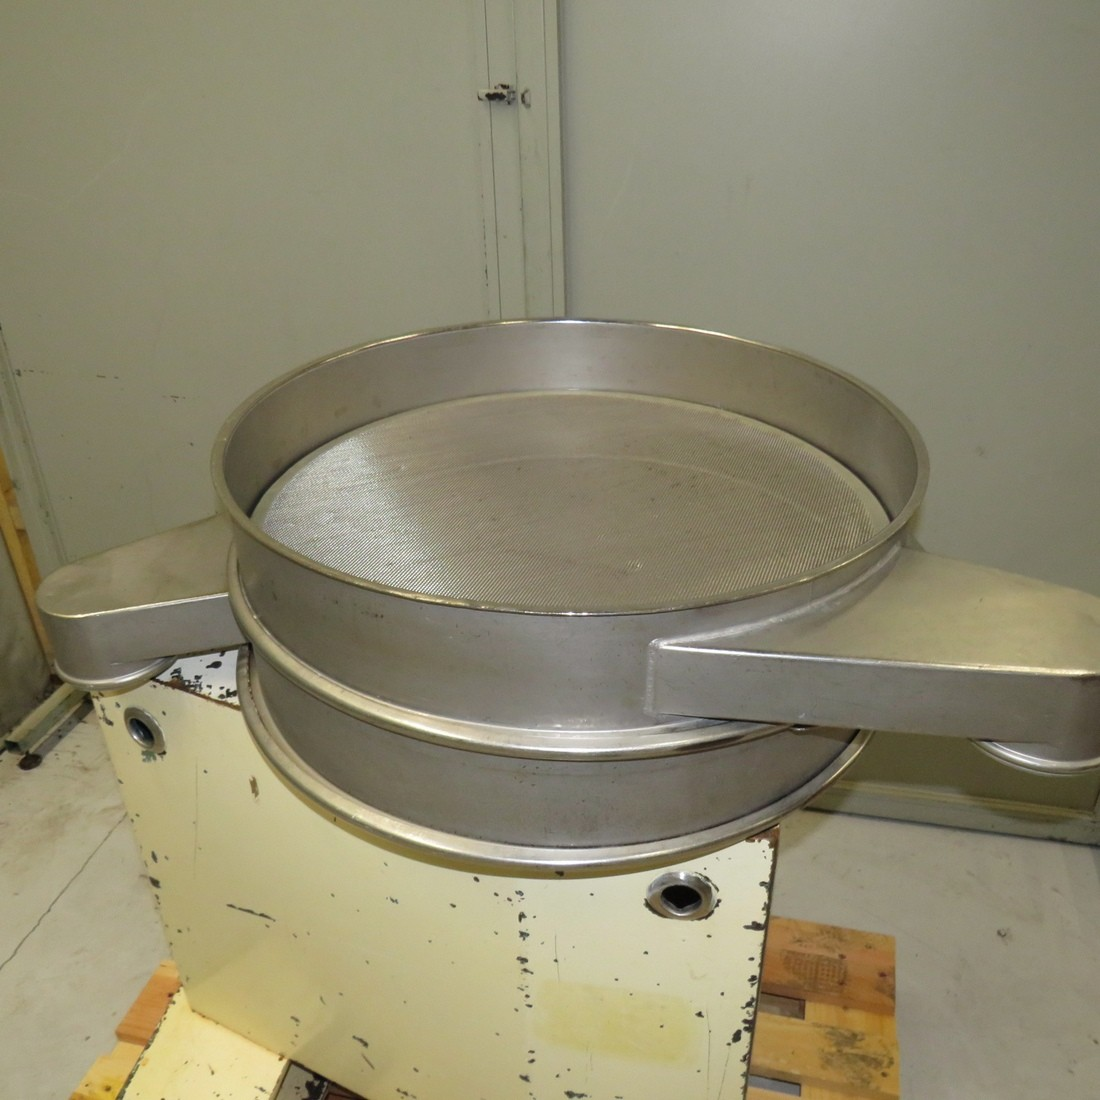 R6SA1133 Circular Sieve CHAUVIN stainless steel Ø 640 mm 1 deck